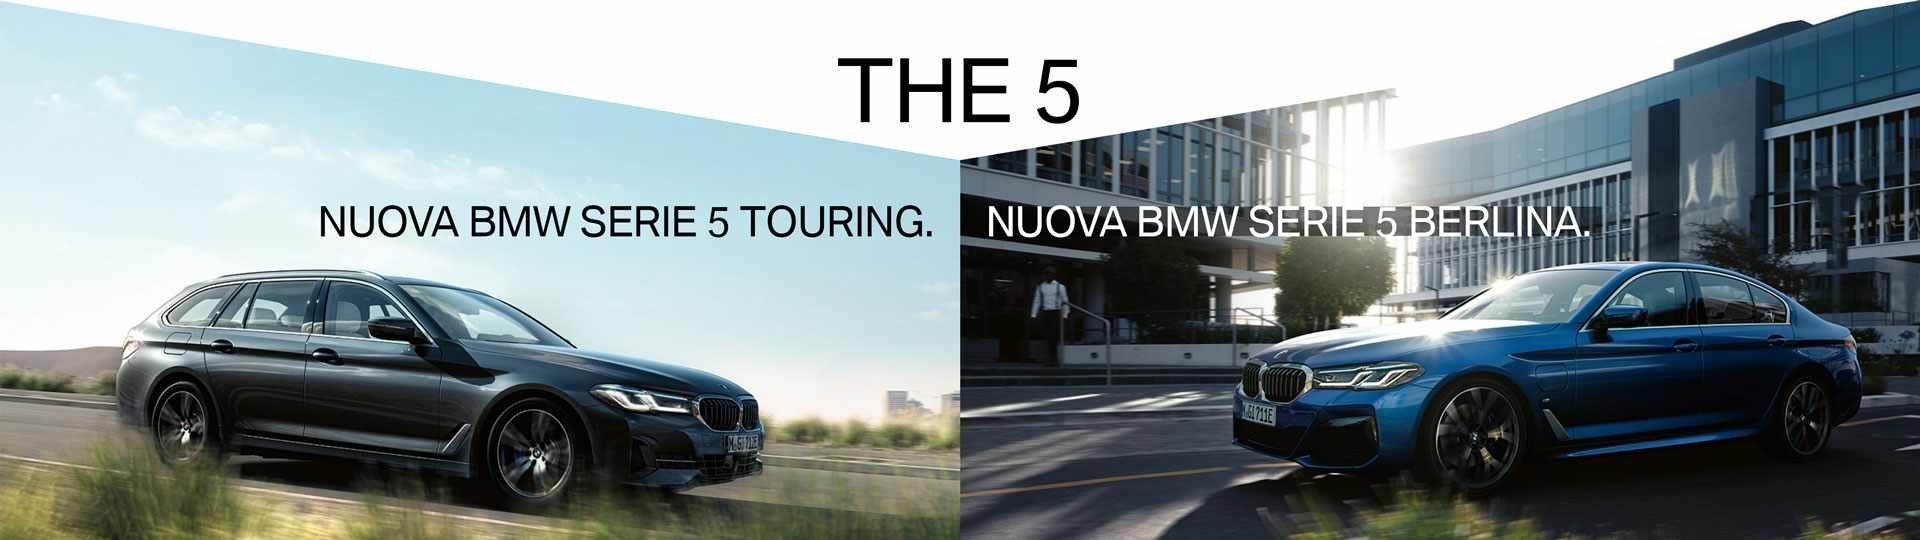 BMW-Serie-5_entrambe_sito2-min.jpg